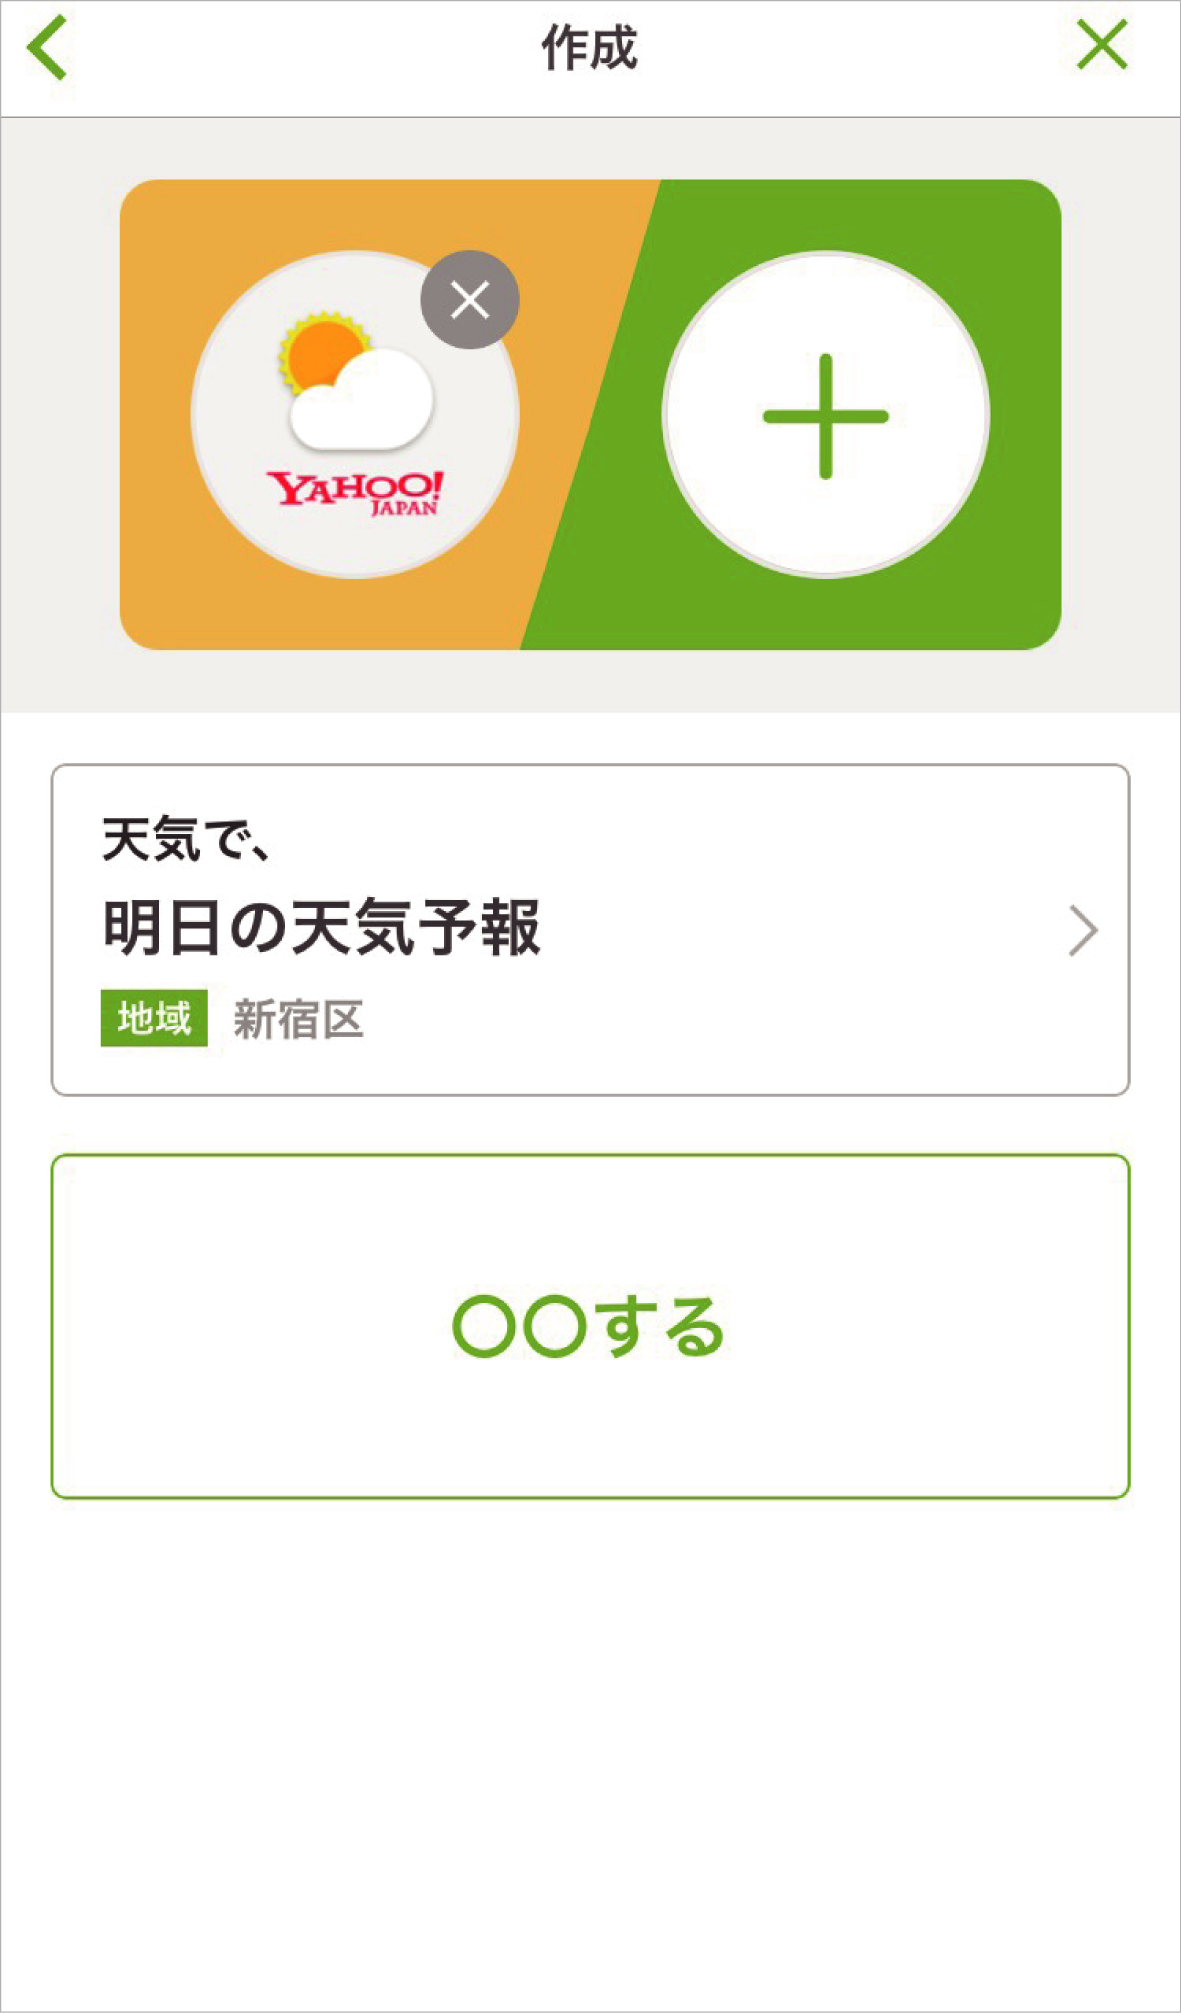 161117_mythings_app-21